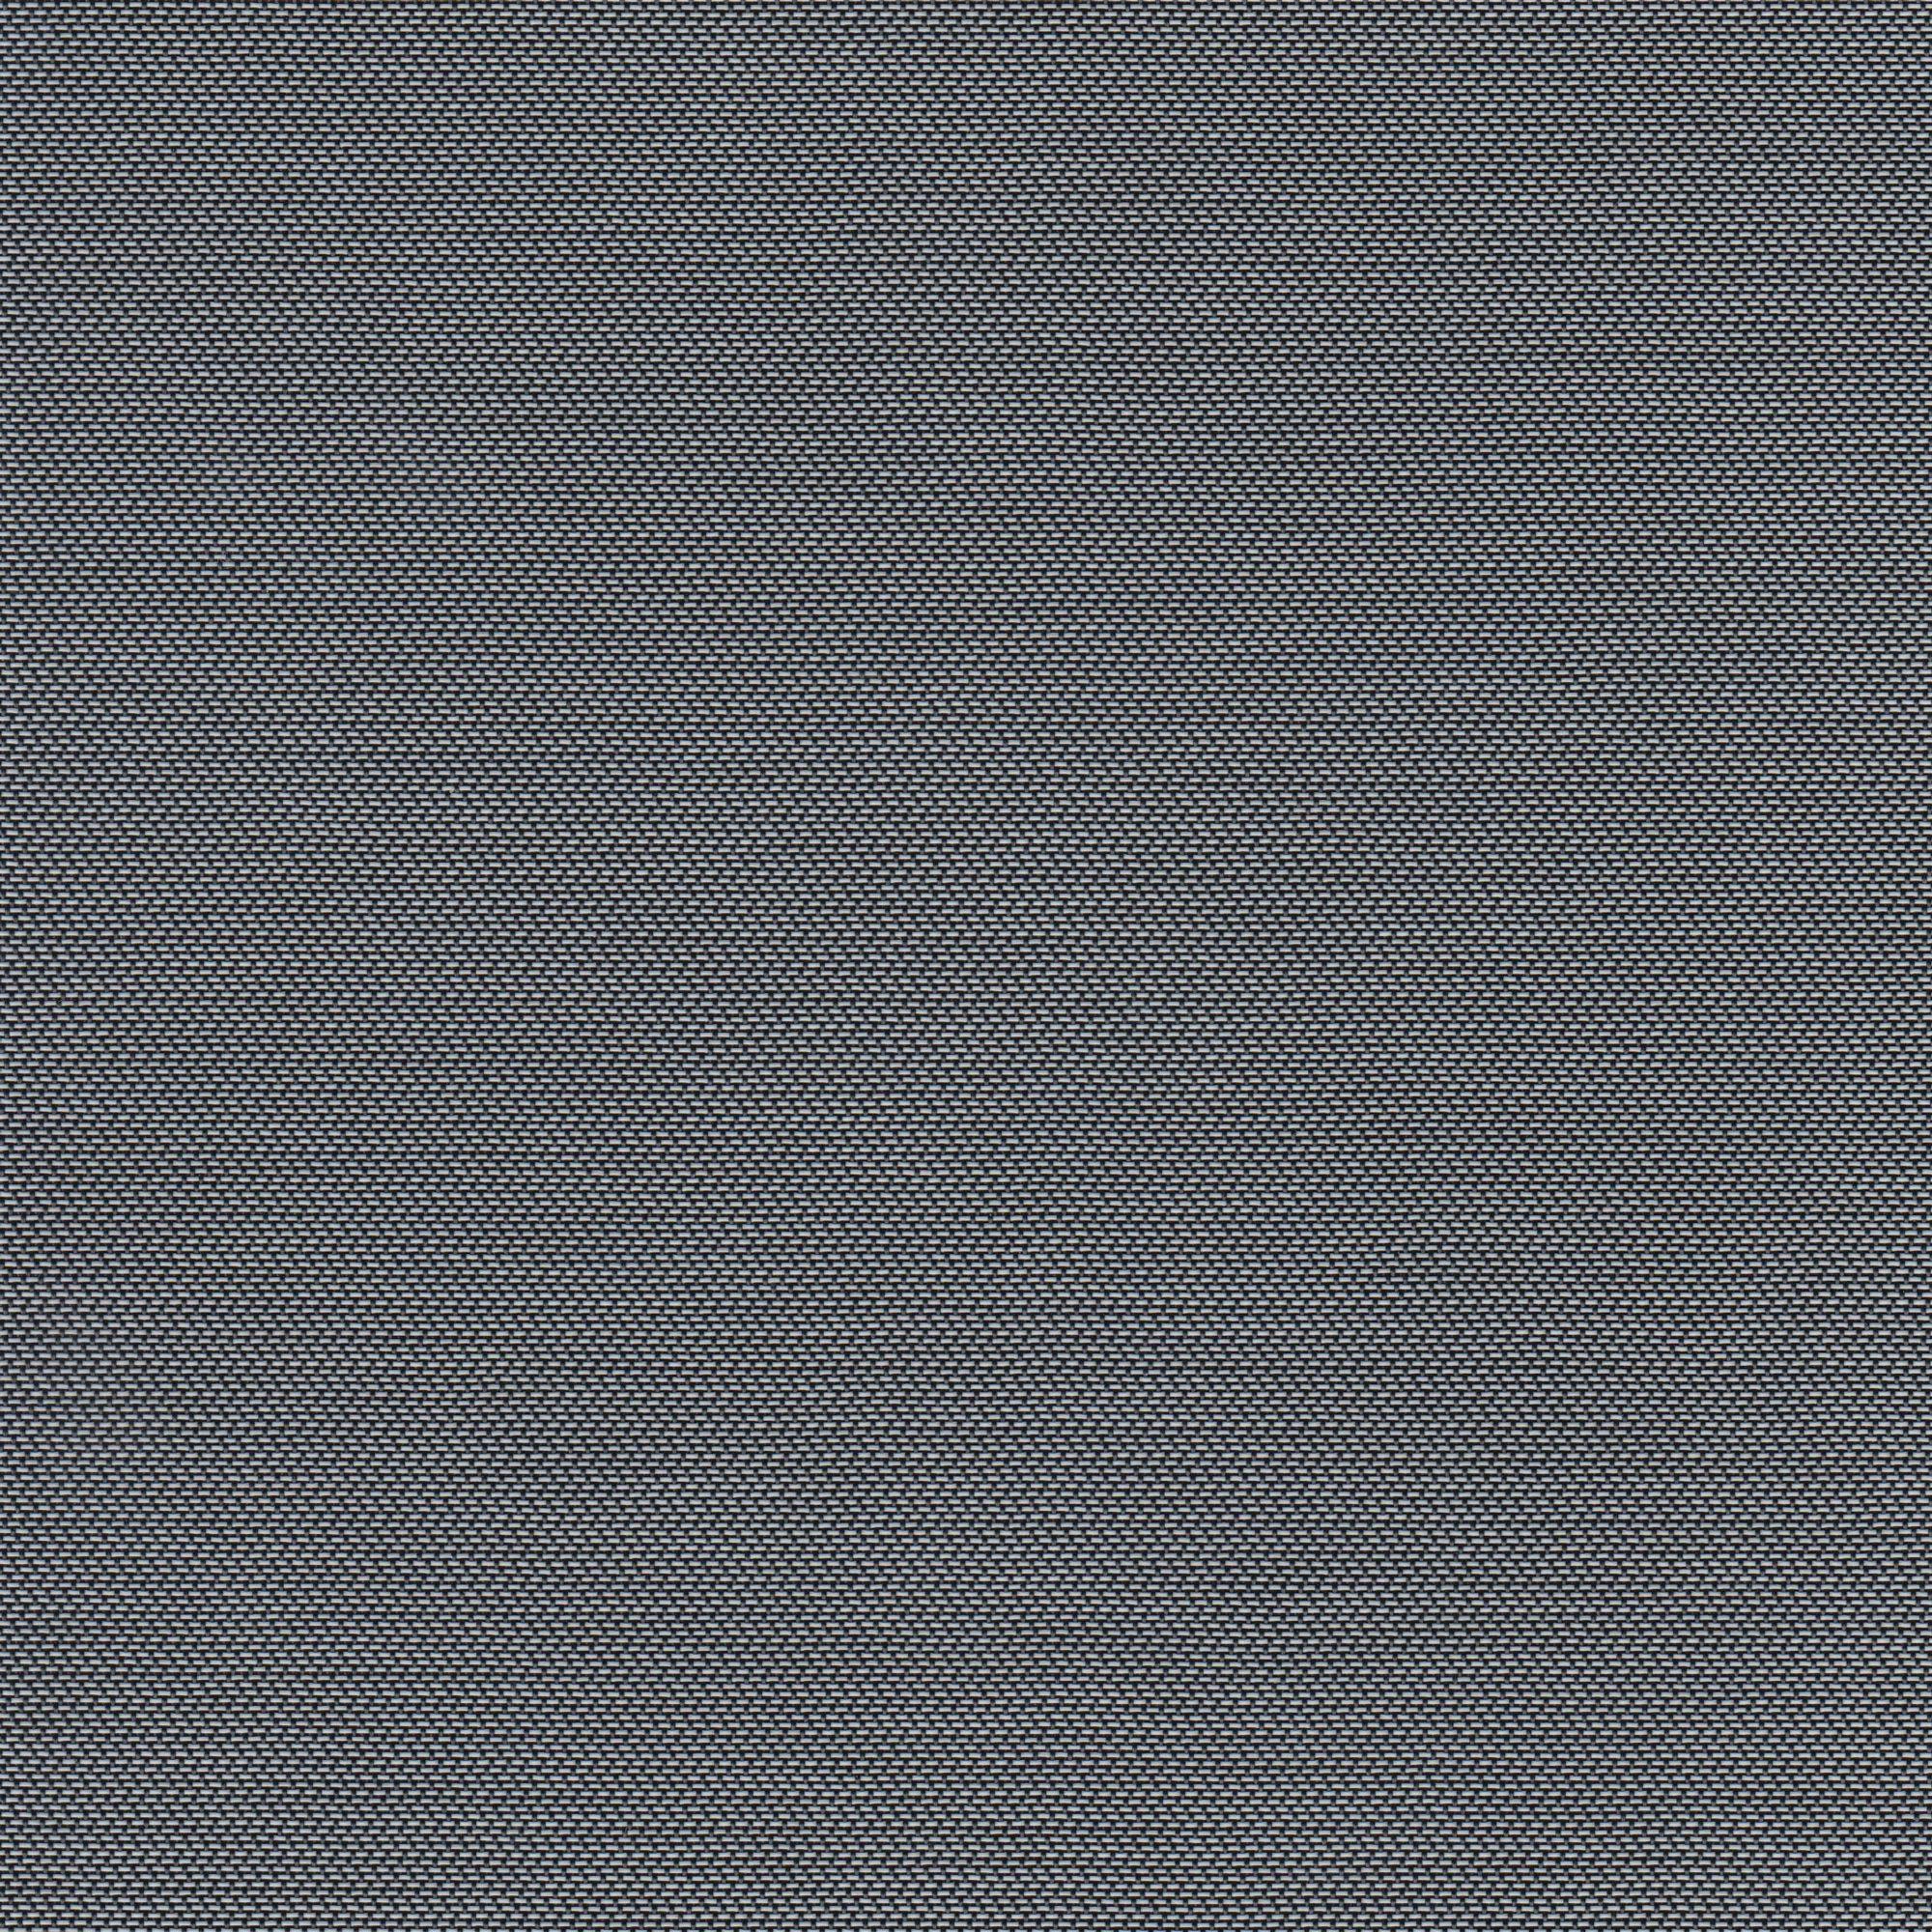 Nordic Screen Twill Black-Pearl